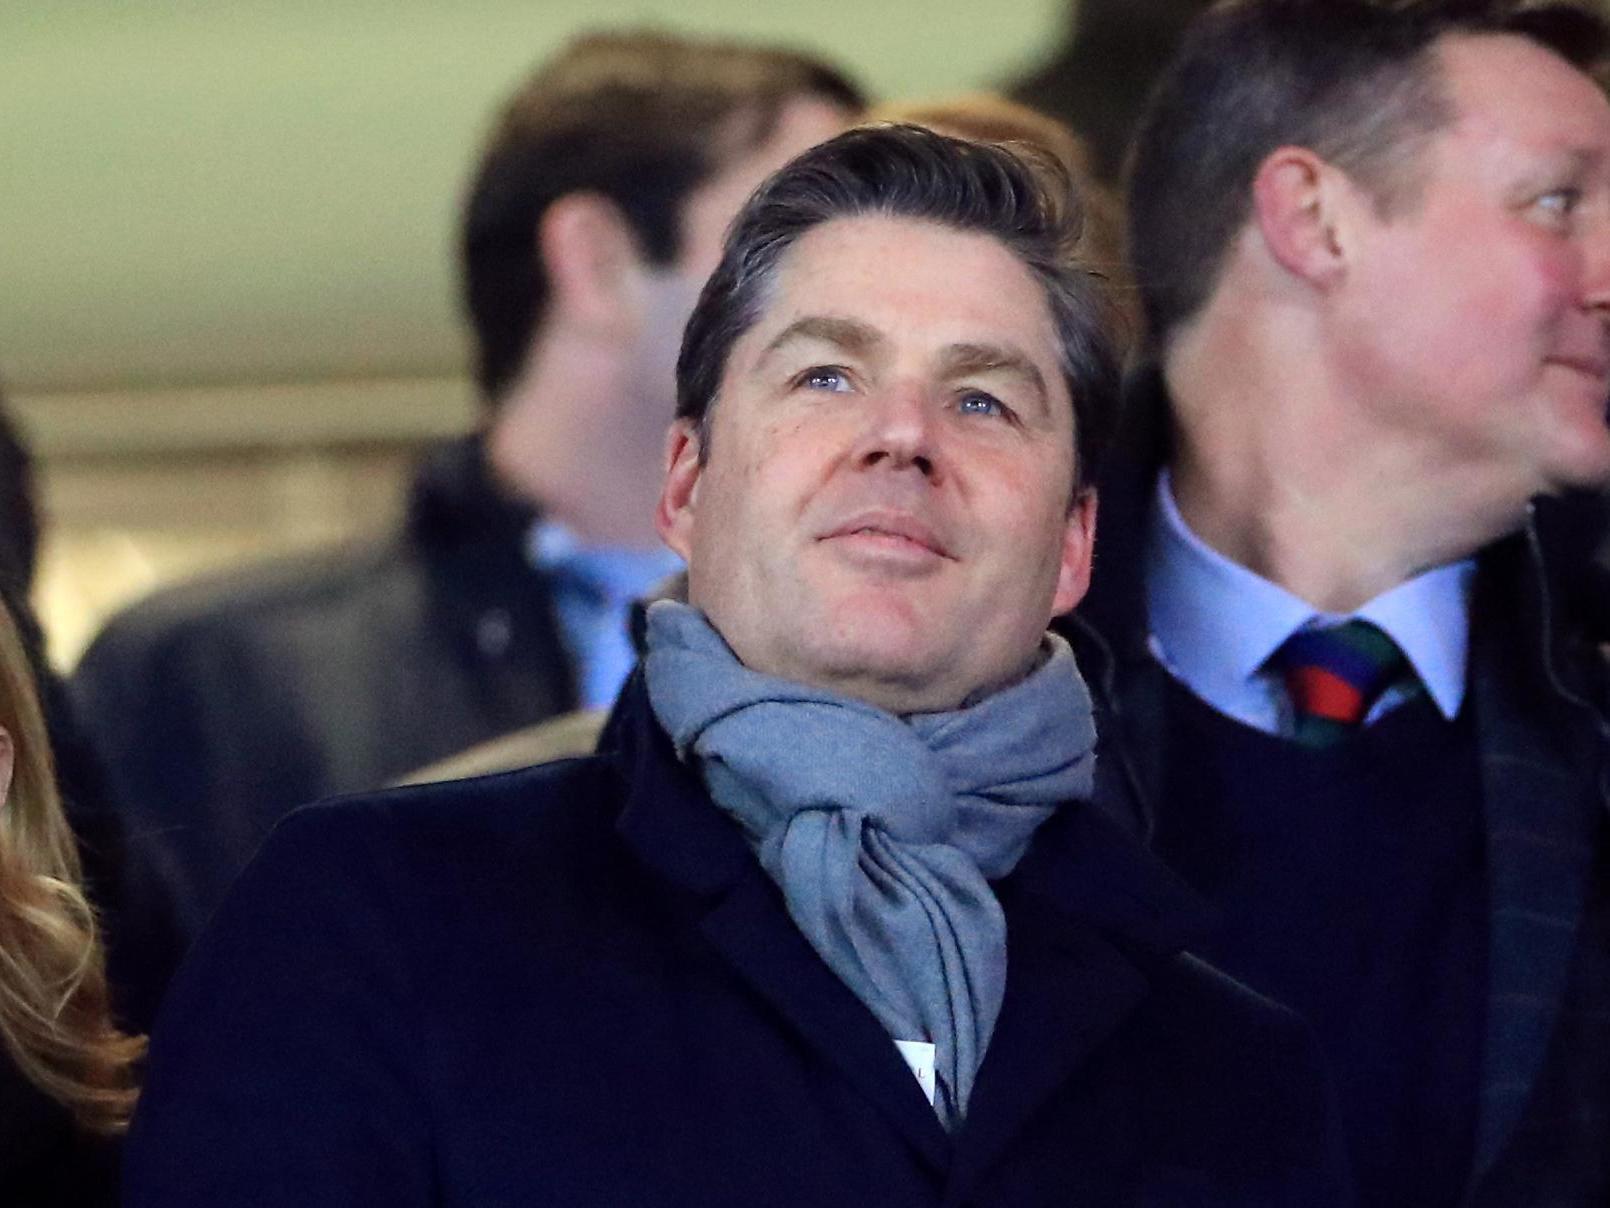 Premier League 'as confident as we can be' about June restart